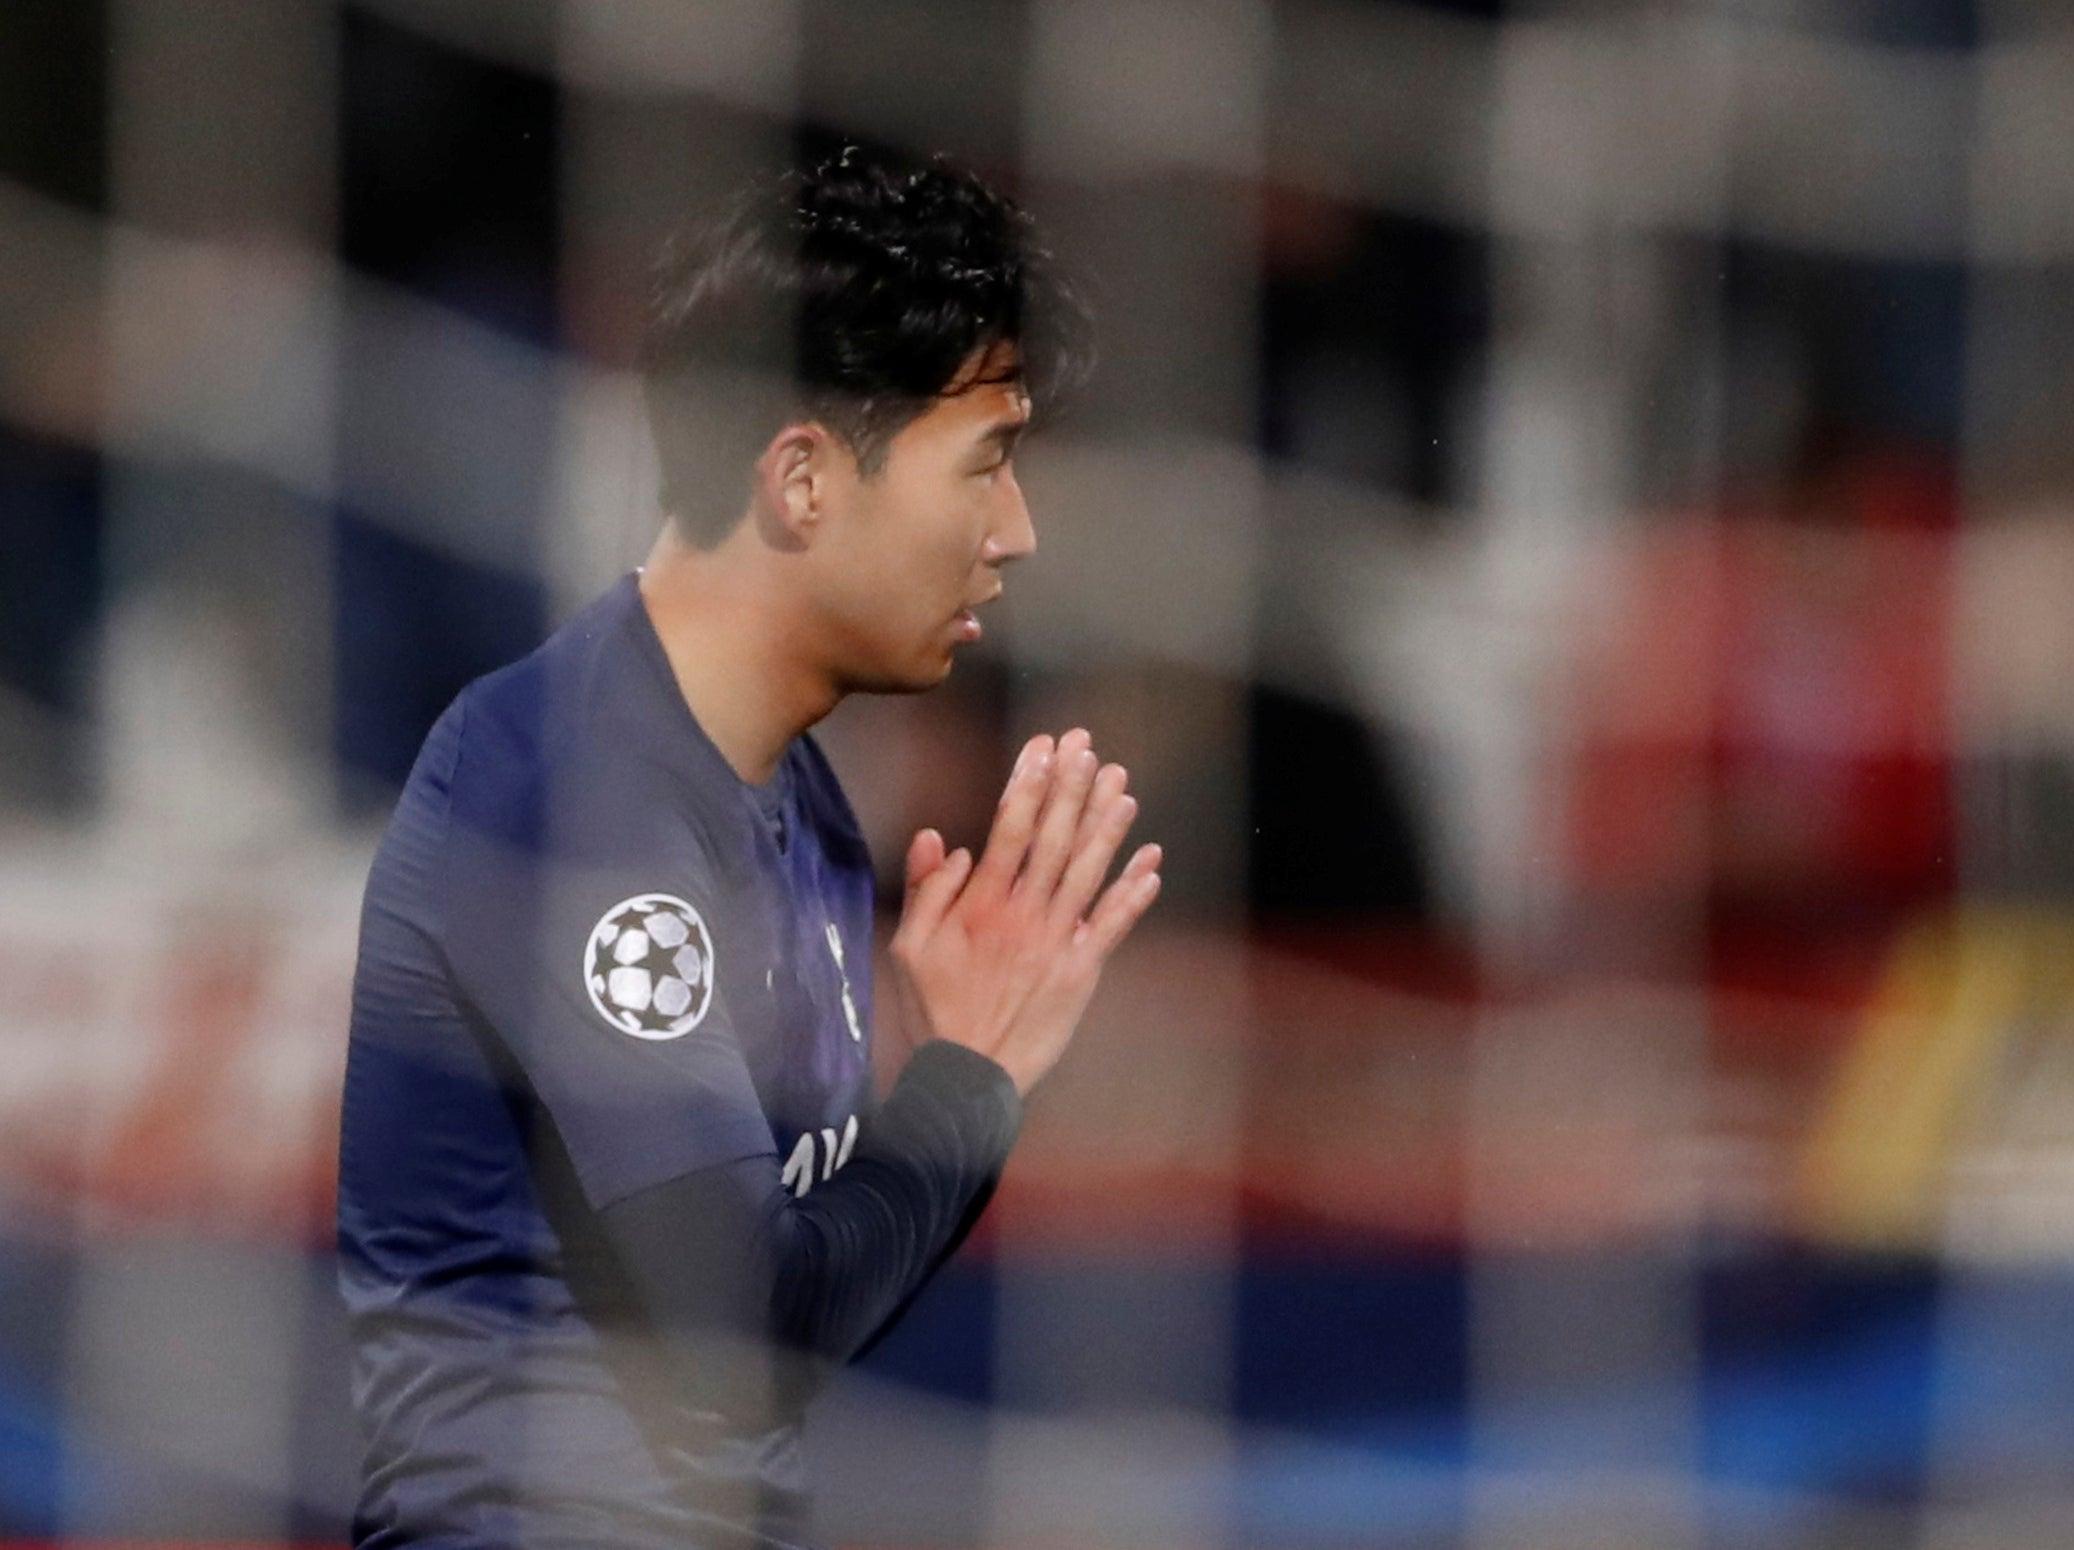 Son Heung Min chắp tay xin lỗi Gomes sau bàn thắng tại Champions League  2